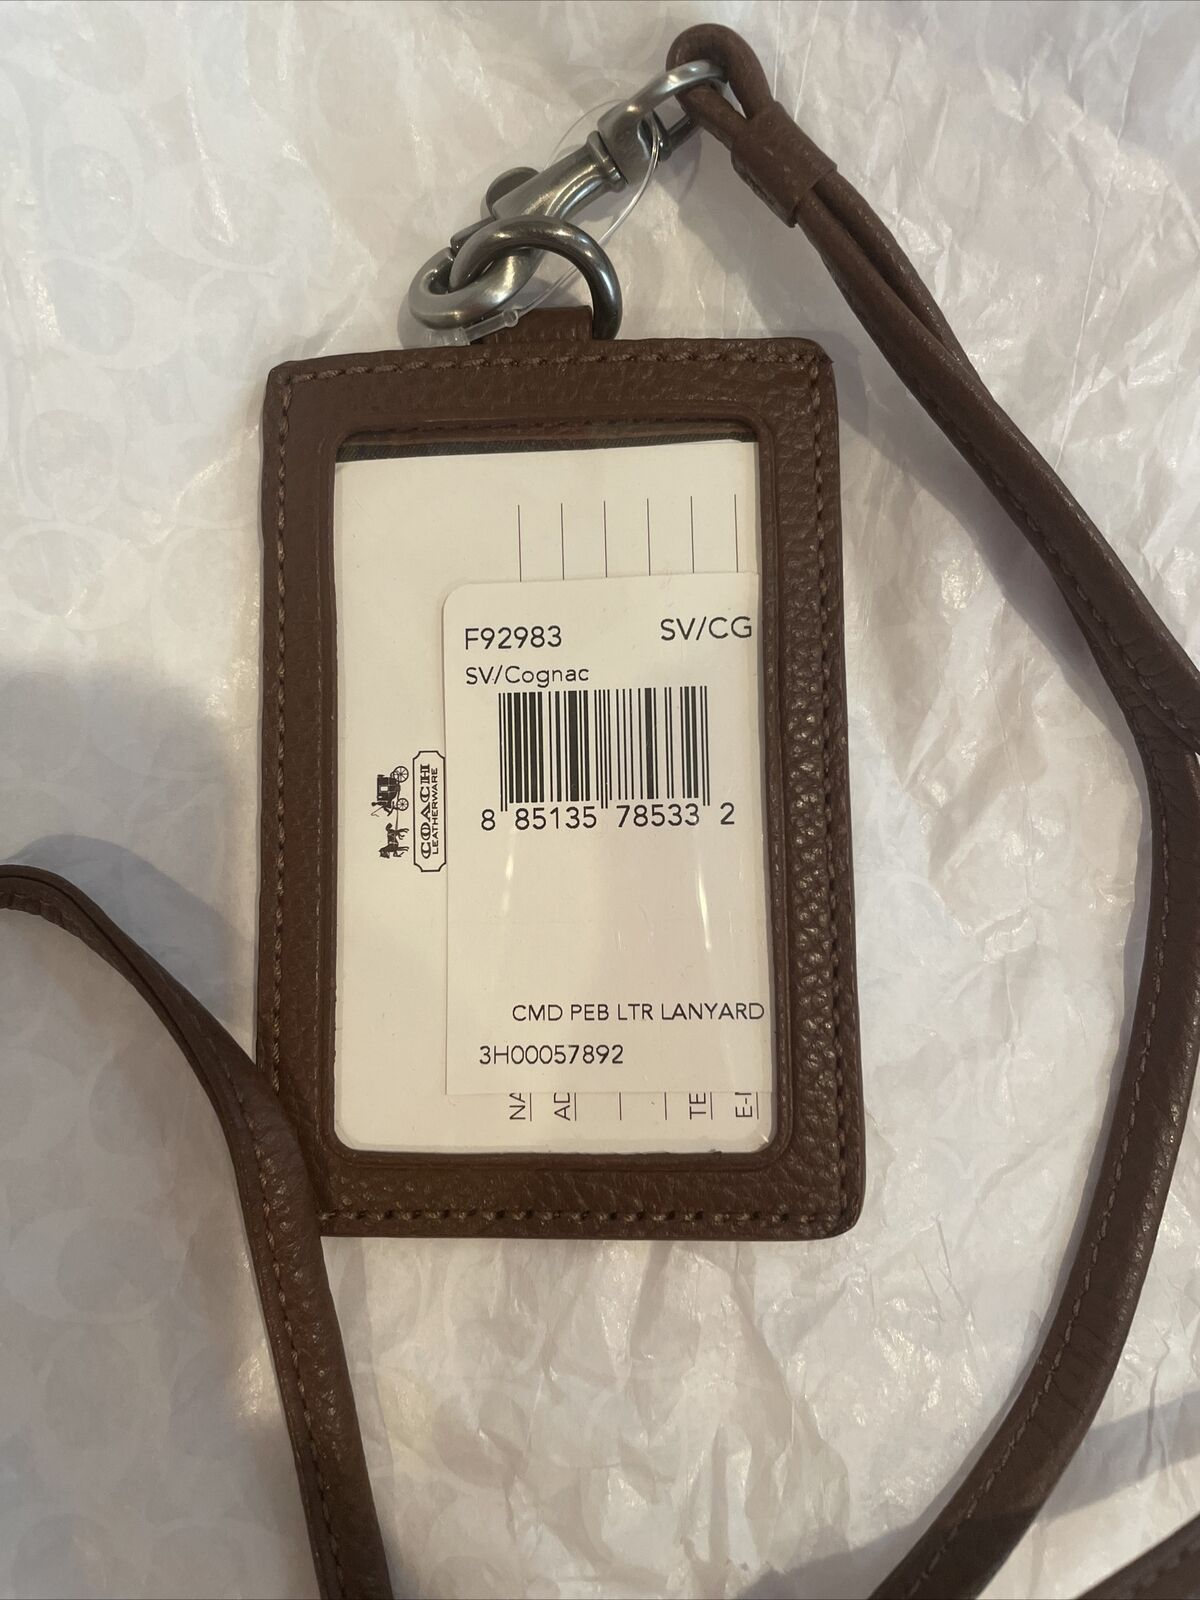 Coach Camden Lanyard ID Holder F92983 Cognac Brown Pebbled Leather Antique Brass